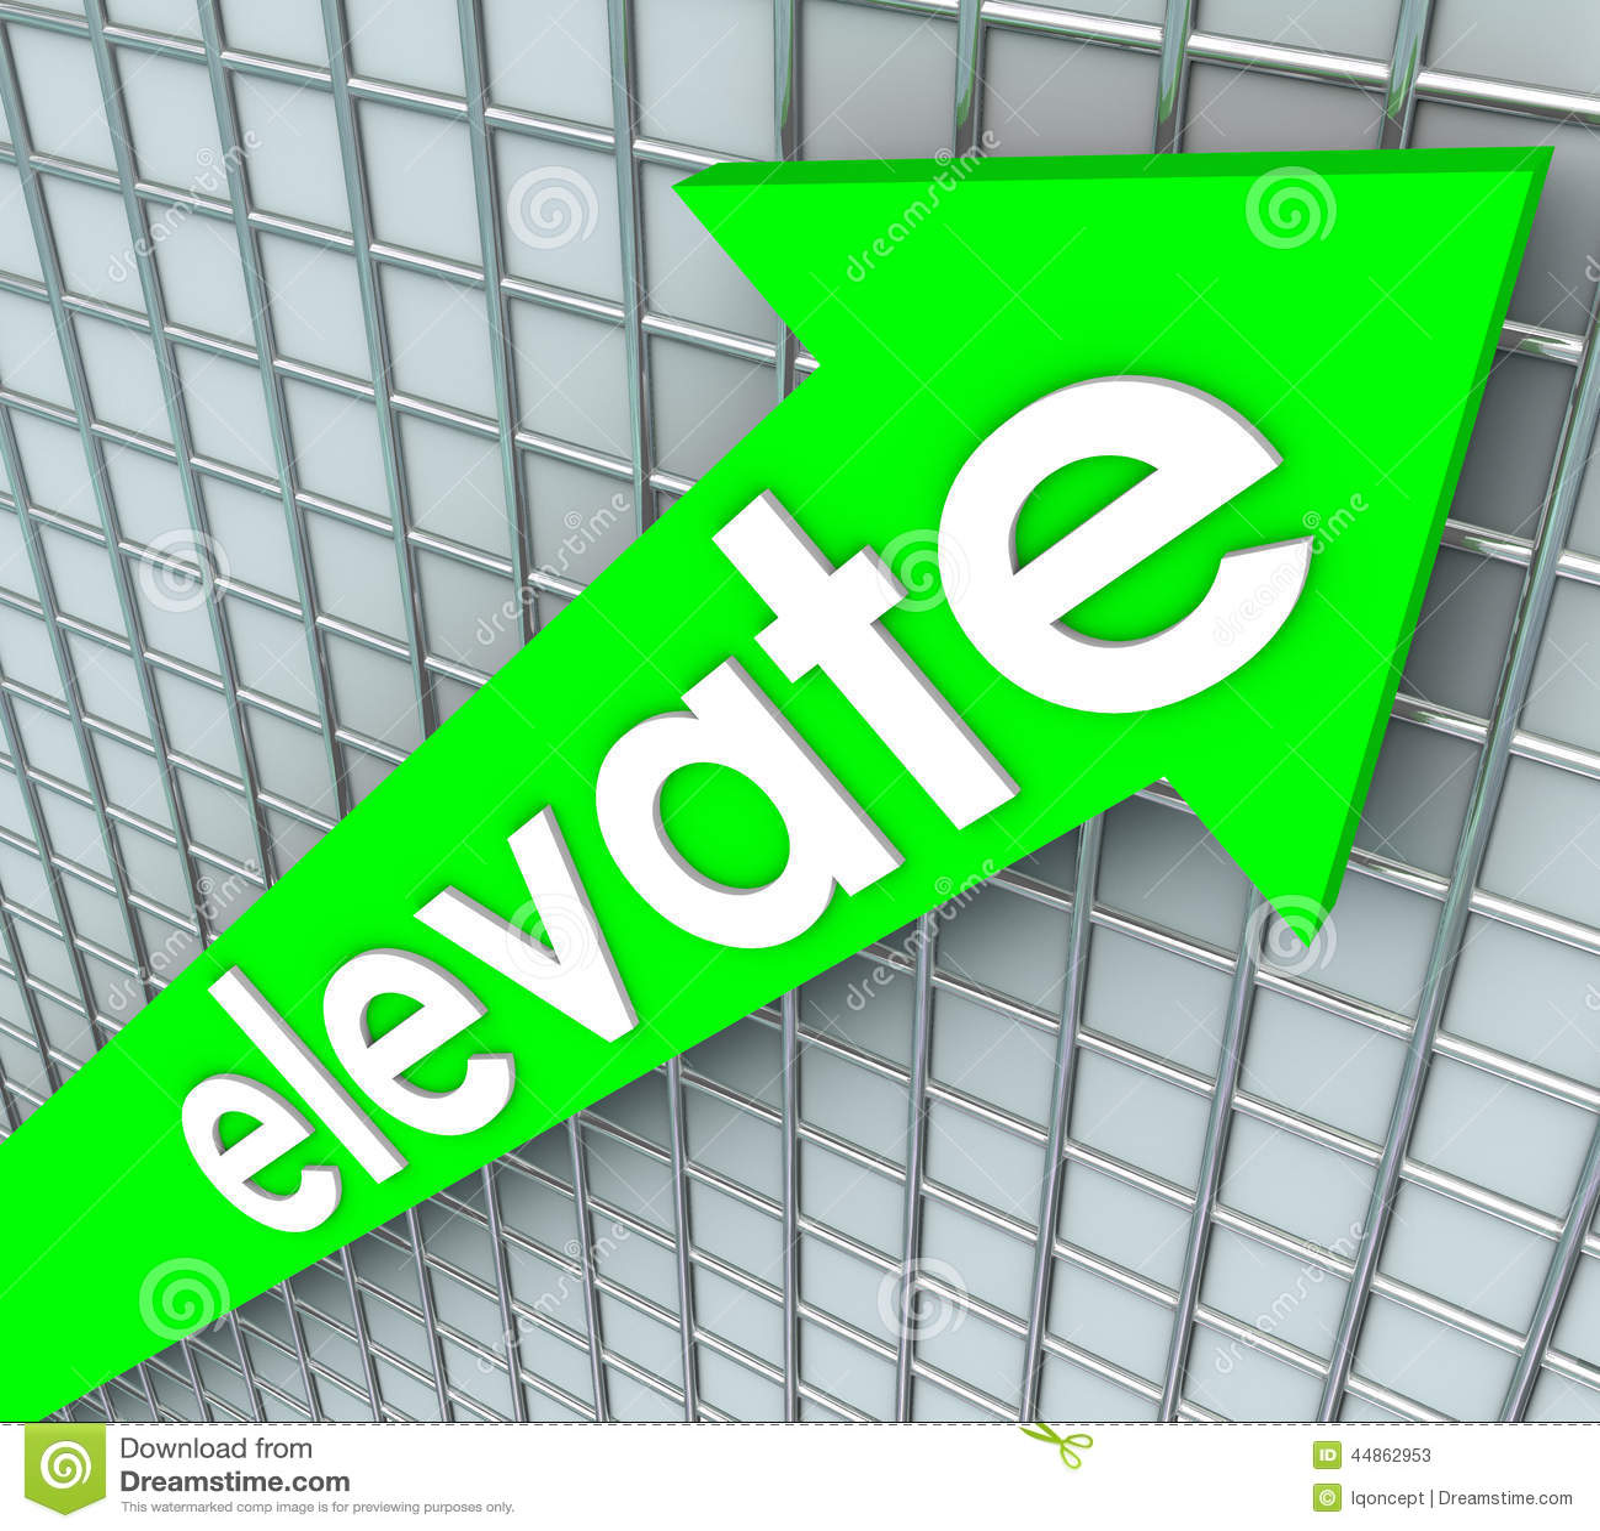 Elevate Word Green Arrow Rising Uplifting Higher Improvement Stock ...